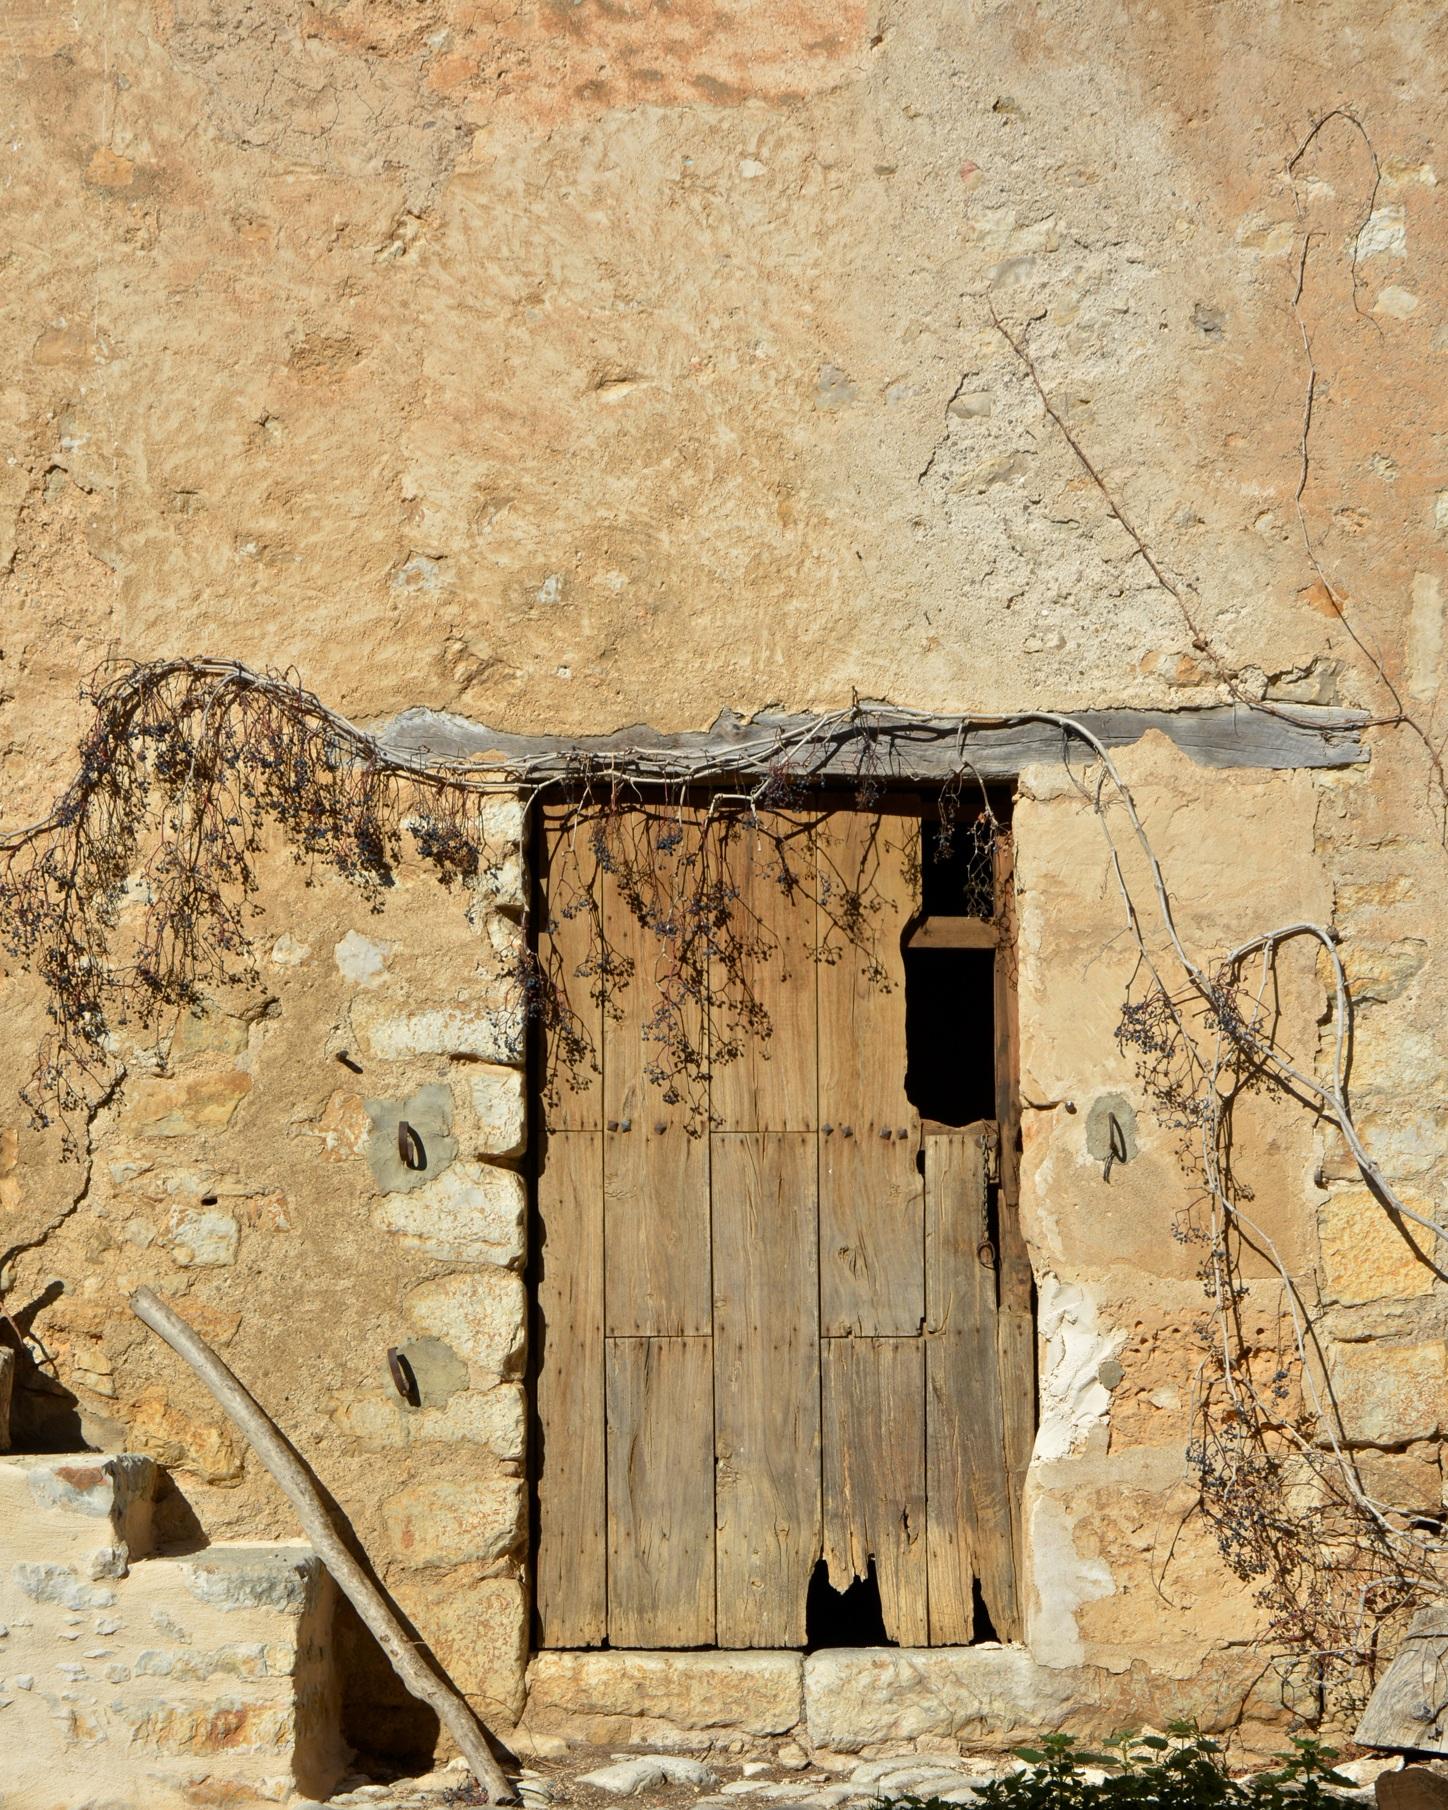 espanyolet_mediterranean_marais_wall_rustic_door.jpg